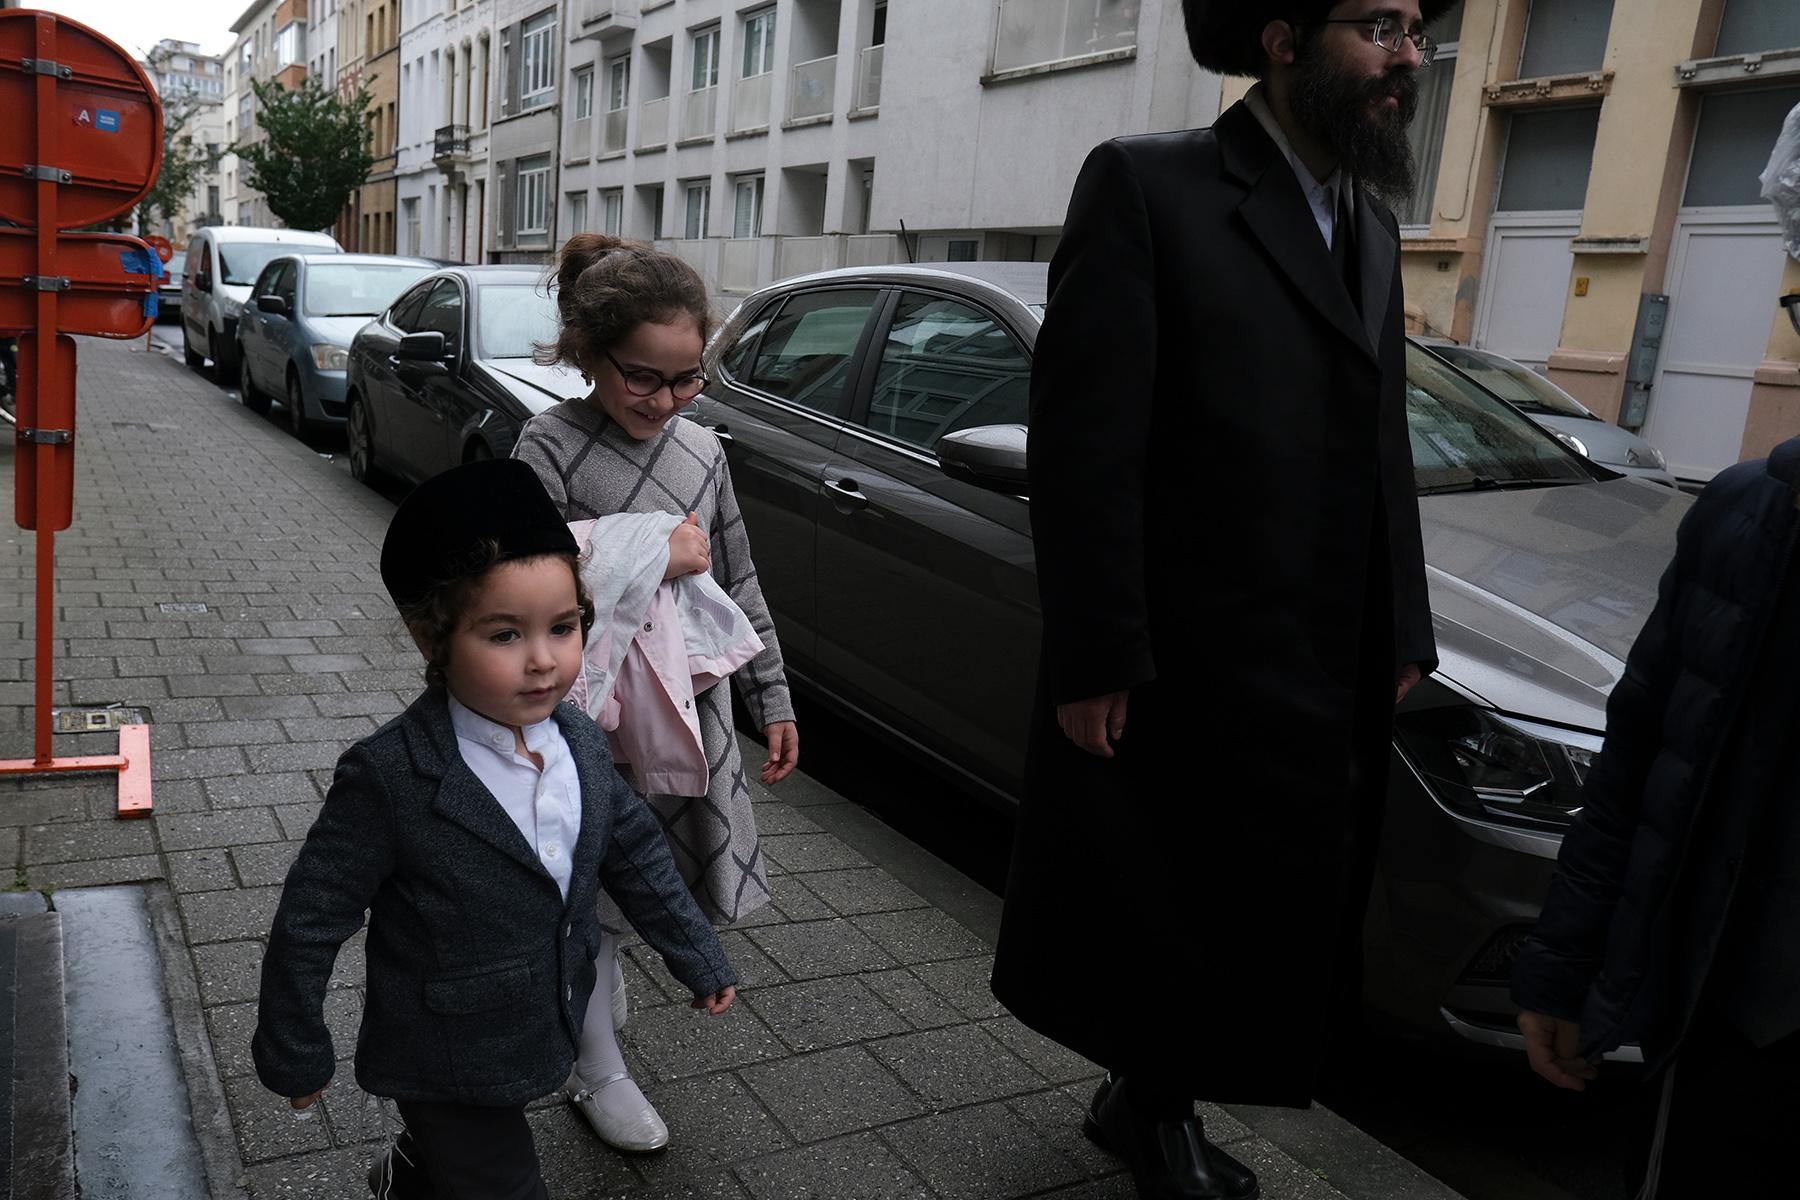 Orthodox Jewish kids in Antwerp